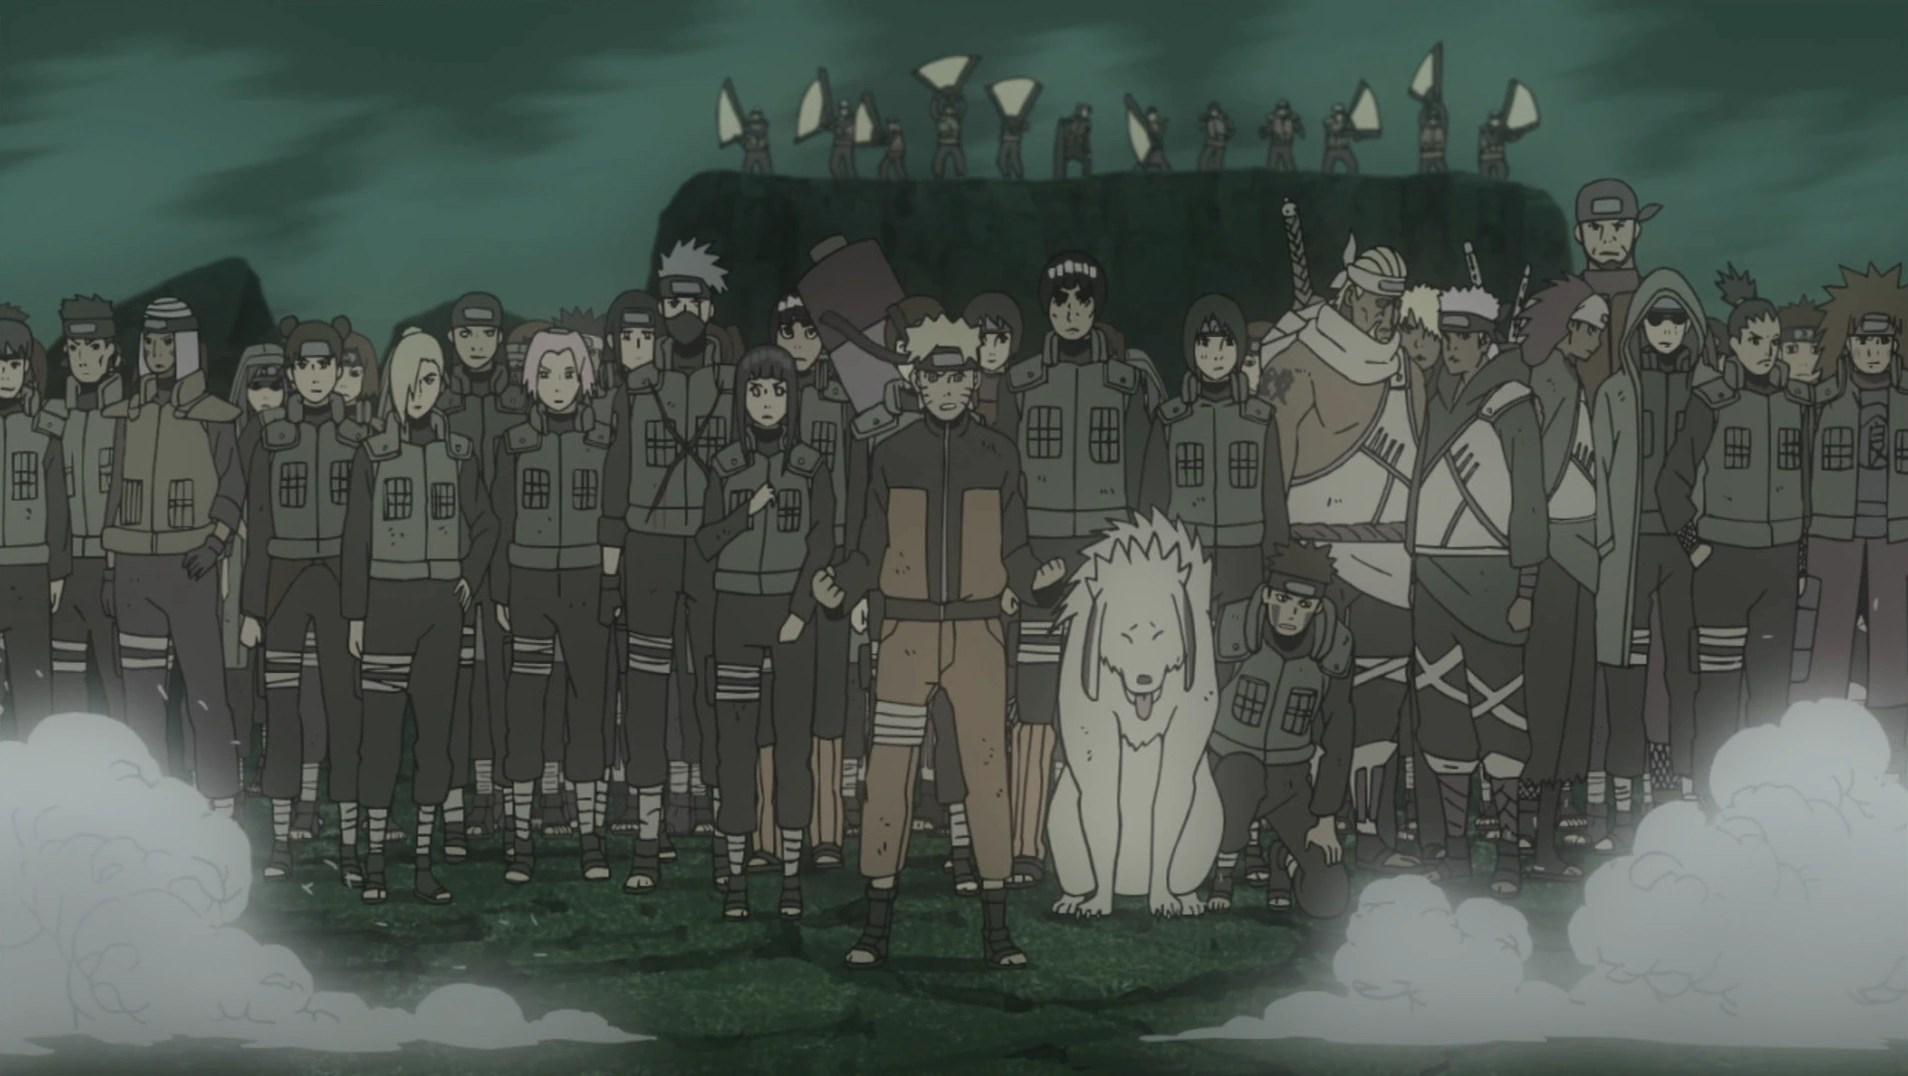 Naruto Quotes About Pain Wallpaper Allied Shinobi Forces Technique Narutopedia Fandom